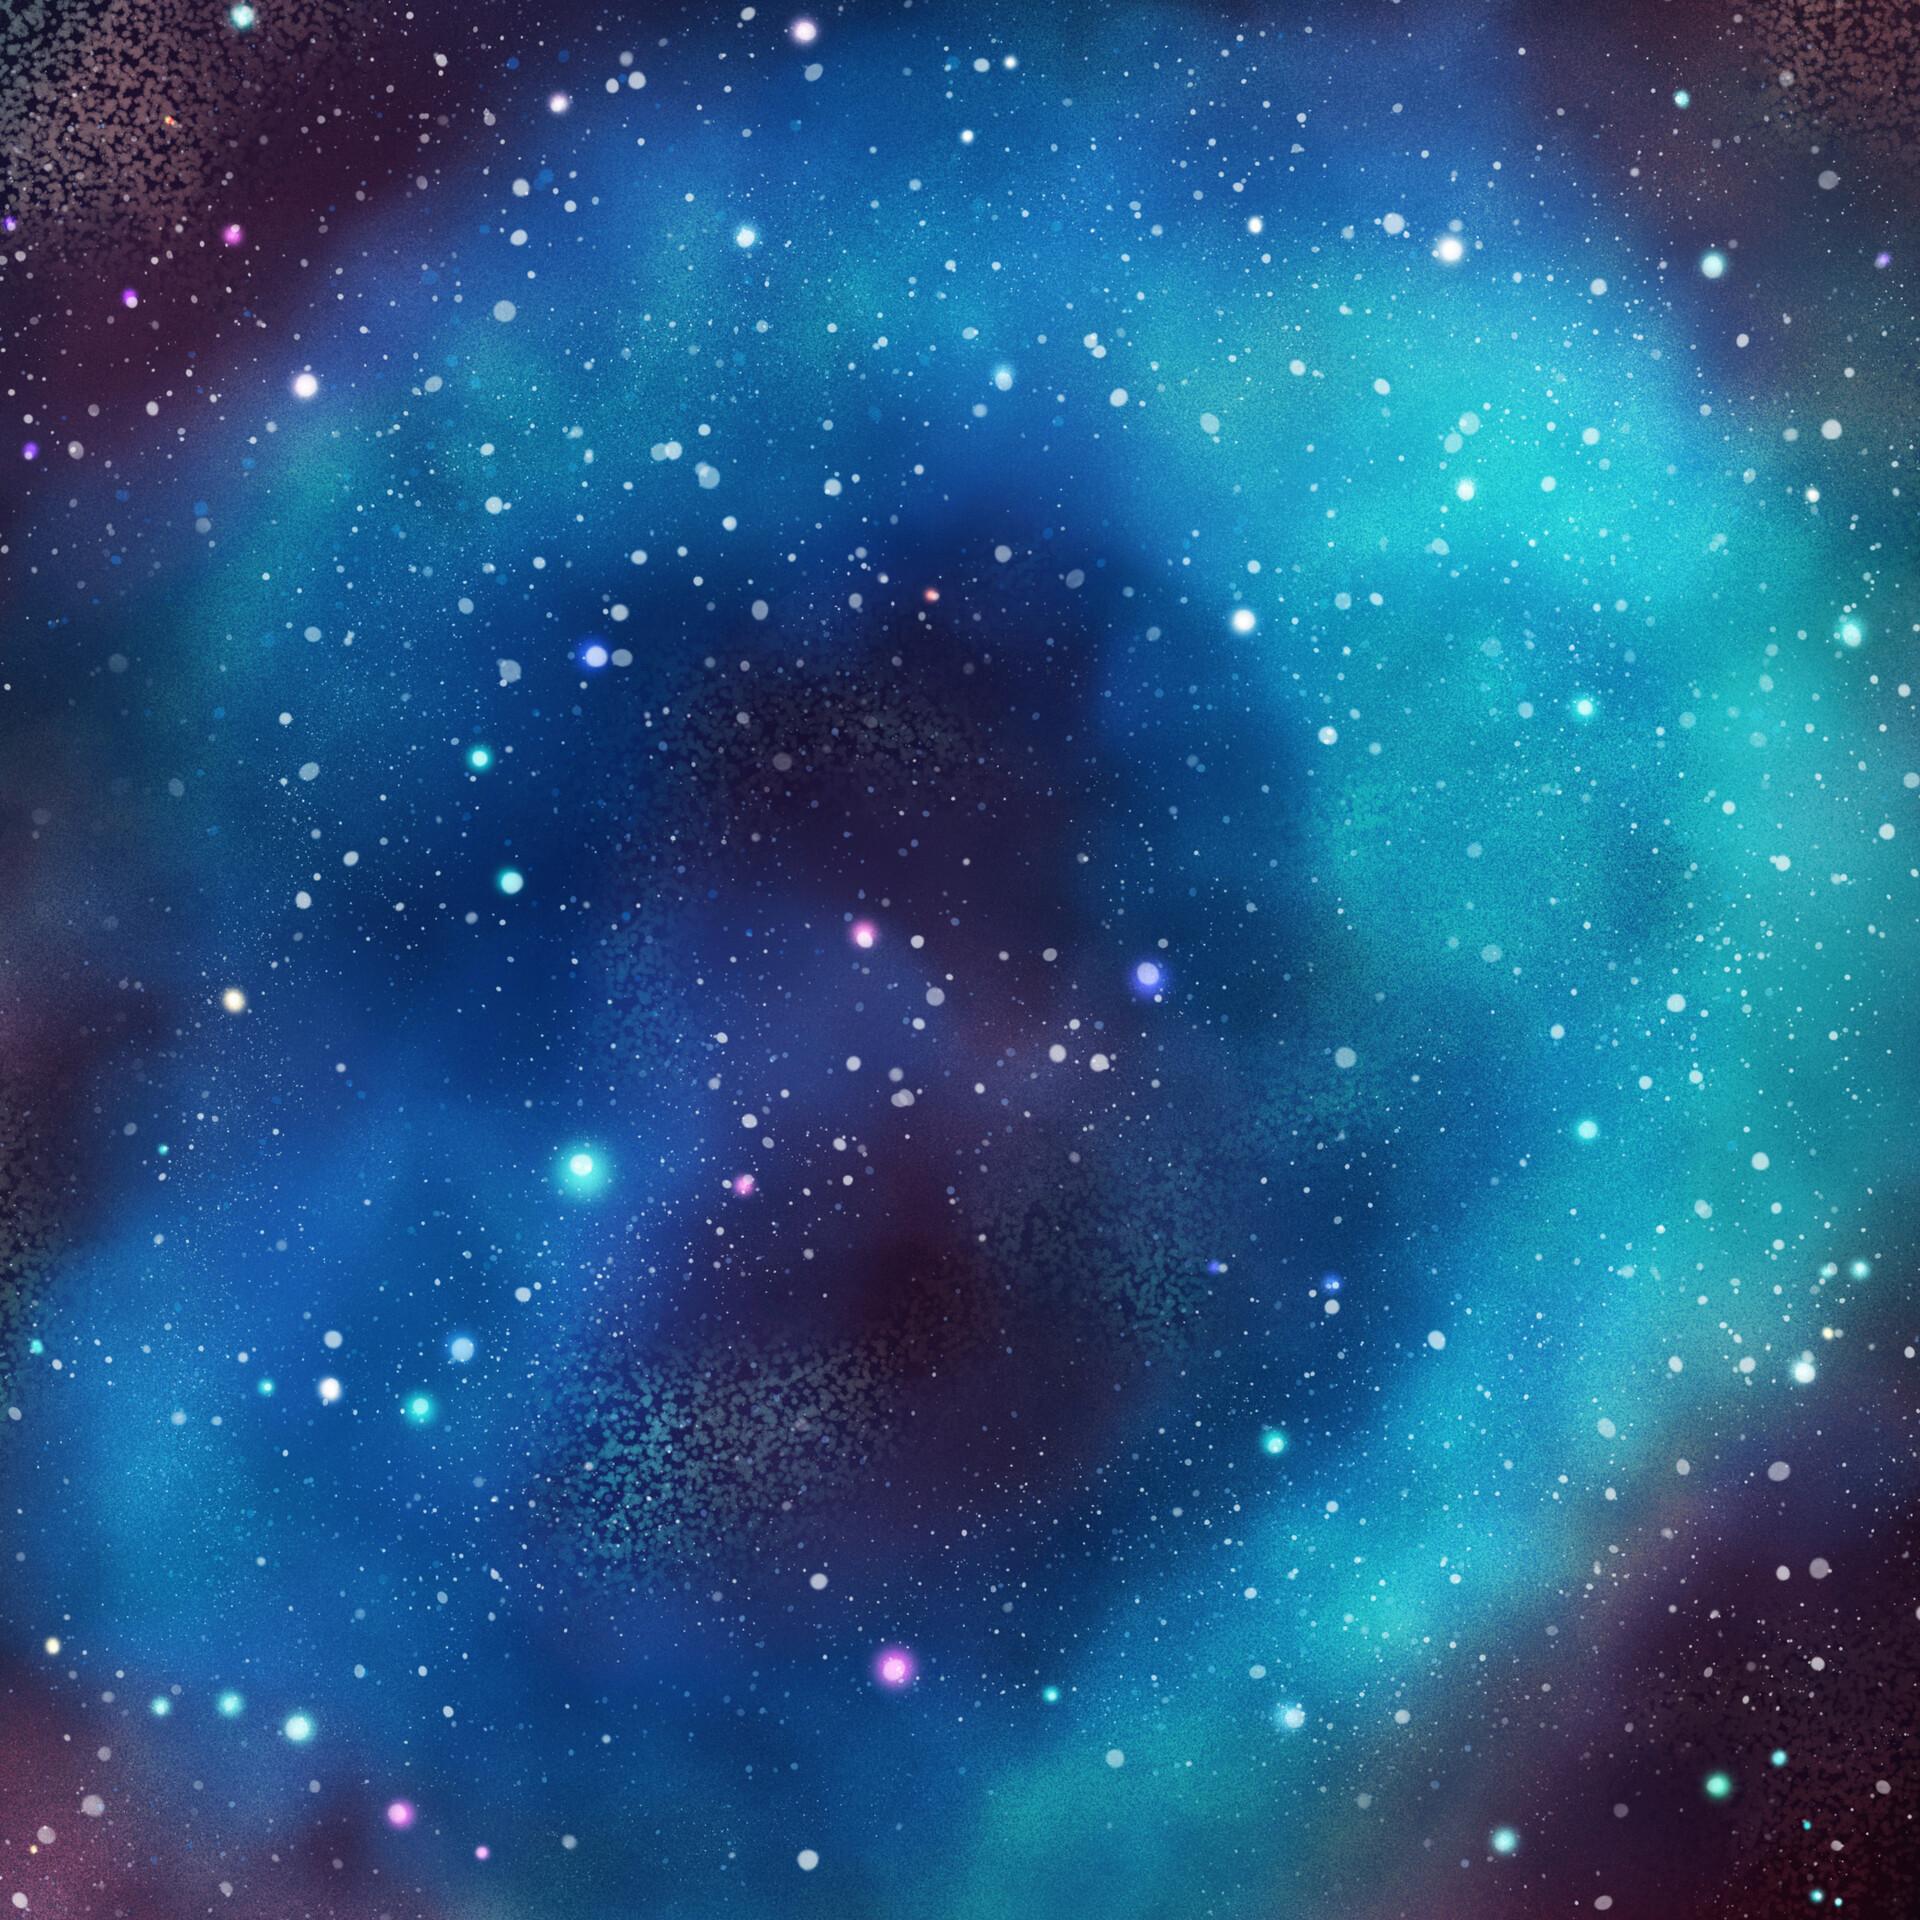 Brienne broyles pl star study 17